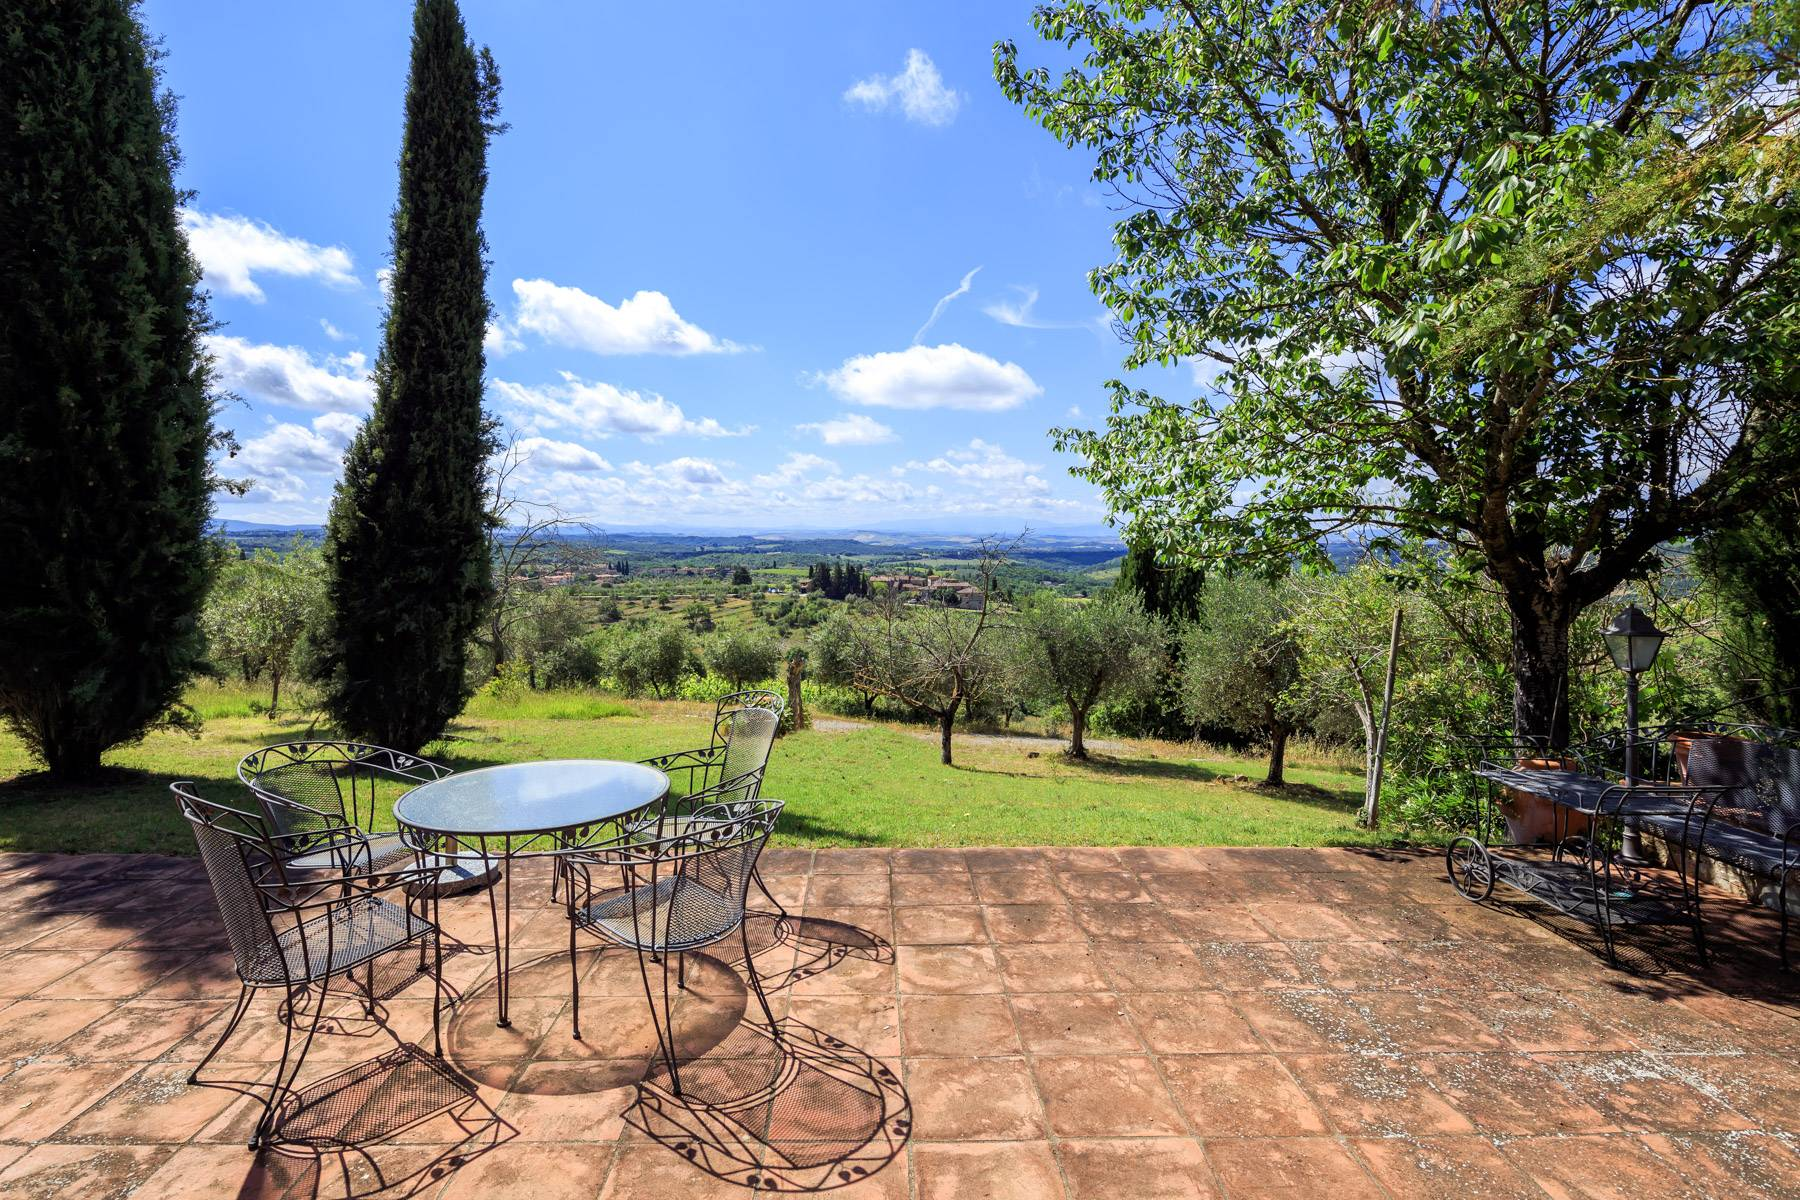 Villa in Vendita a Gaiole In Chianti: 5 locali, 465 mq - Foto 4